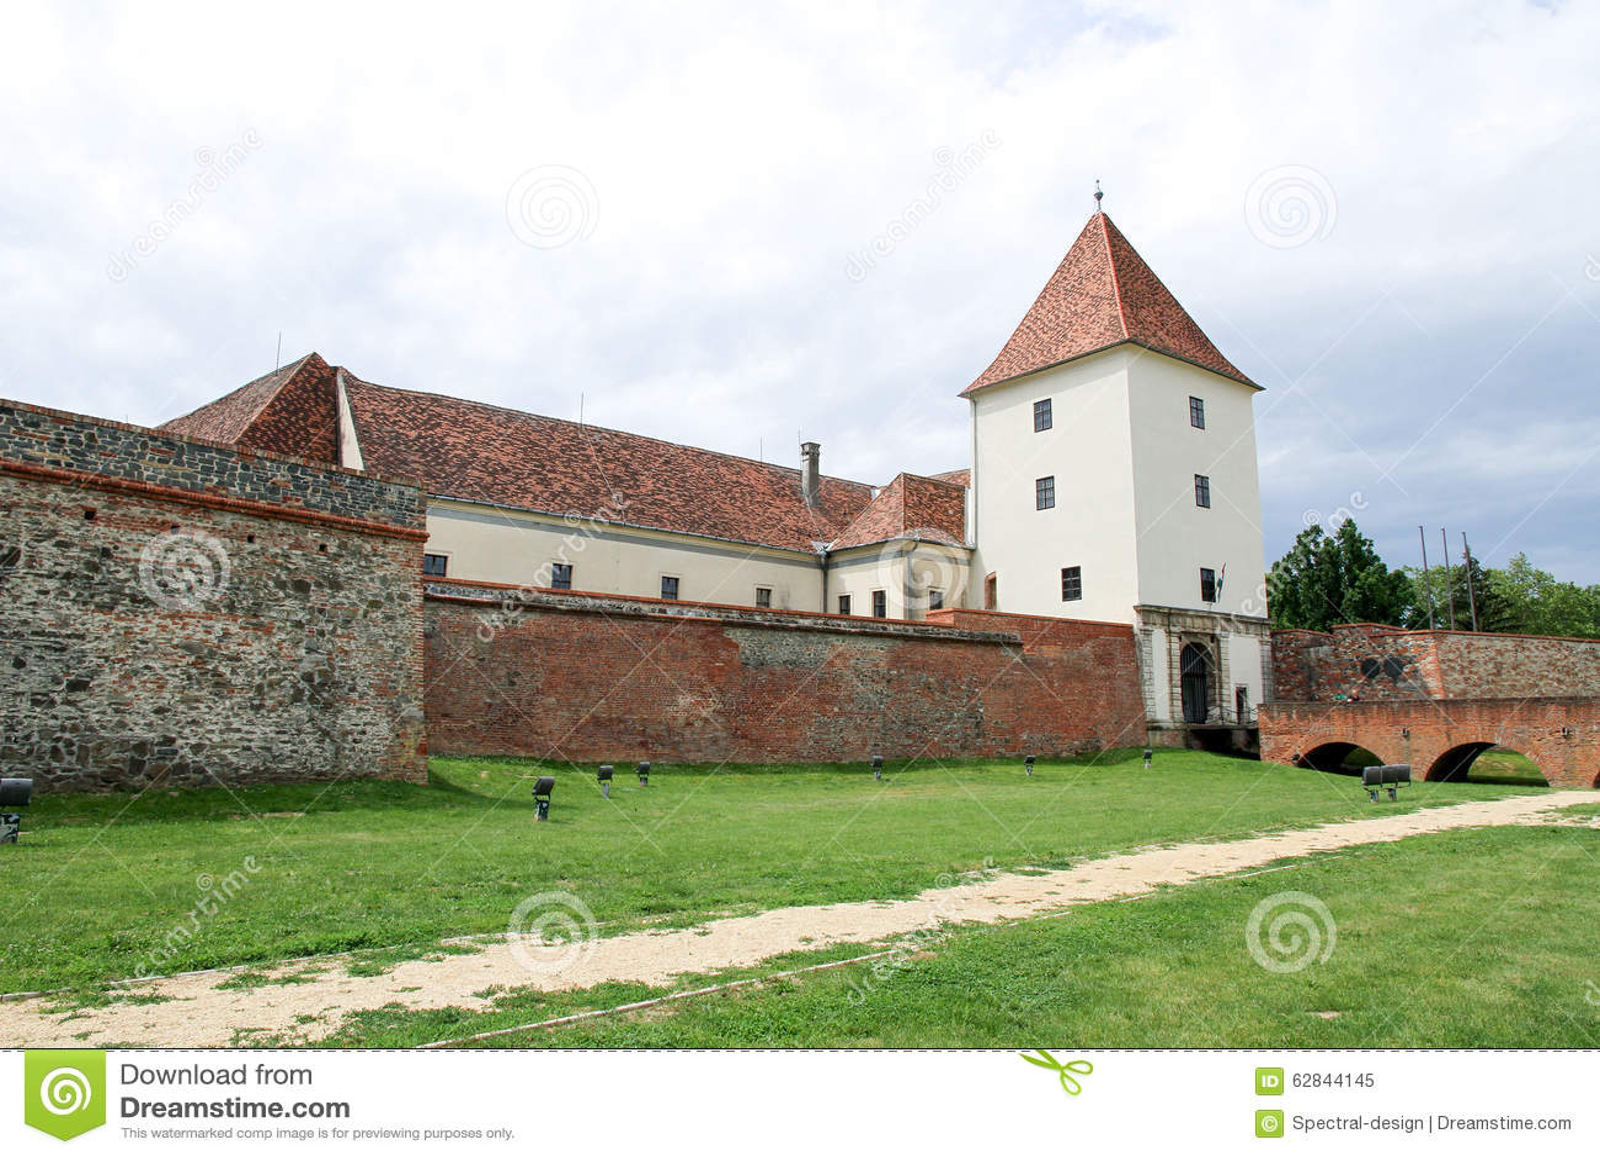 Sarvar Hungary  city photo : Medieval castle in Sarvar, Hungary, Europe.